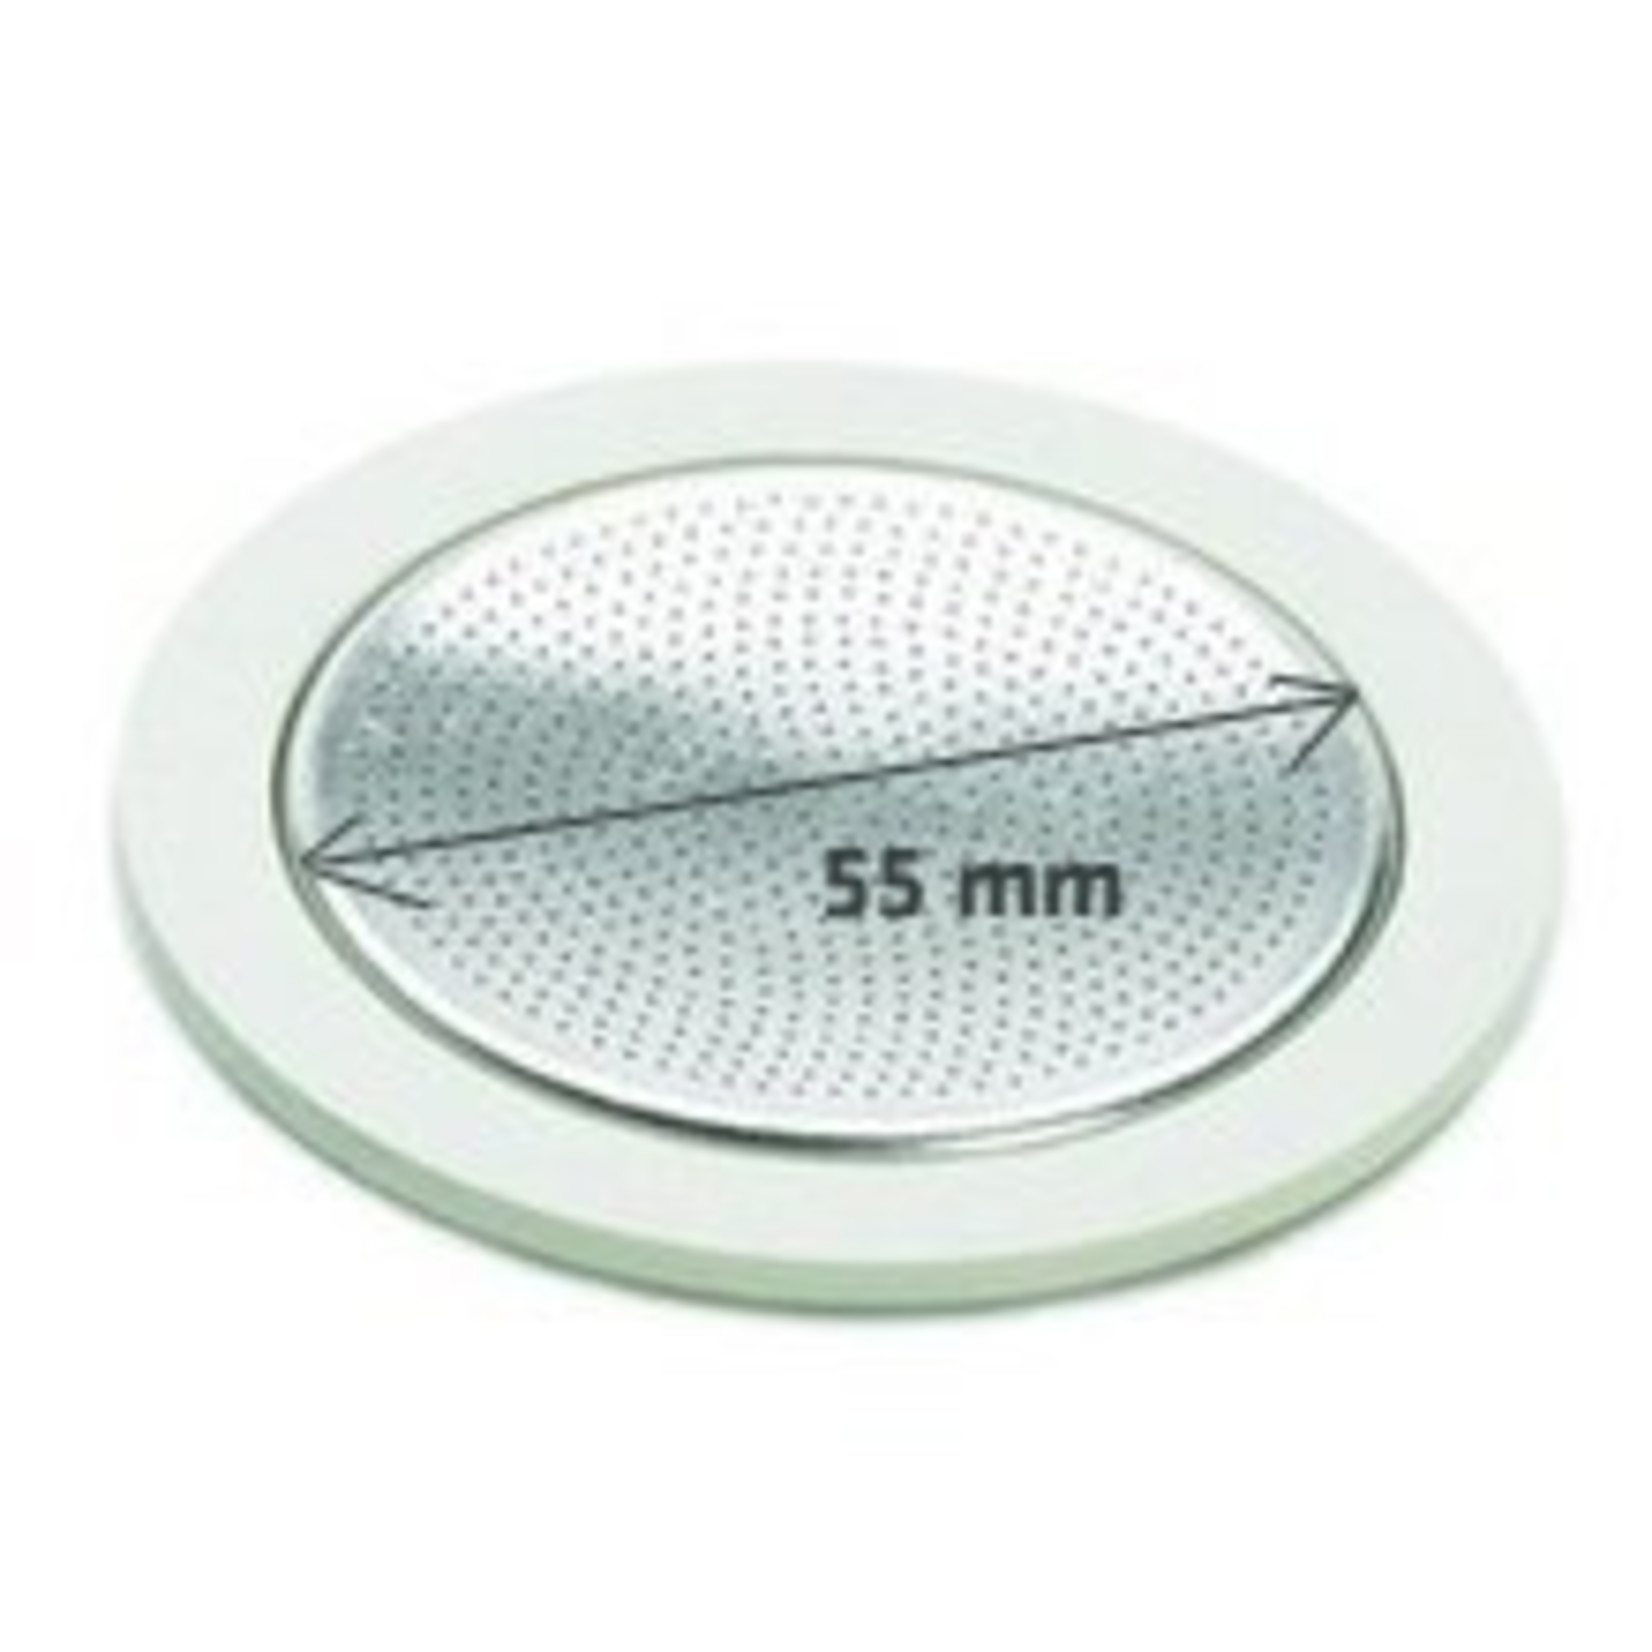 Bialetti Bialetti filterplaatje met rubberen ringen 6 kops aluminium